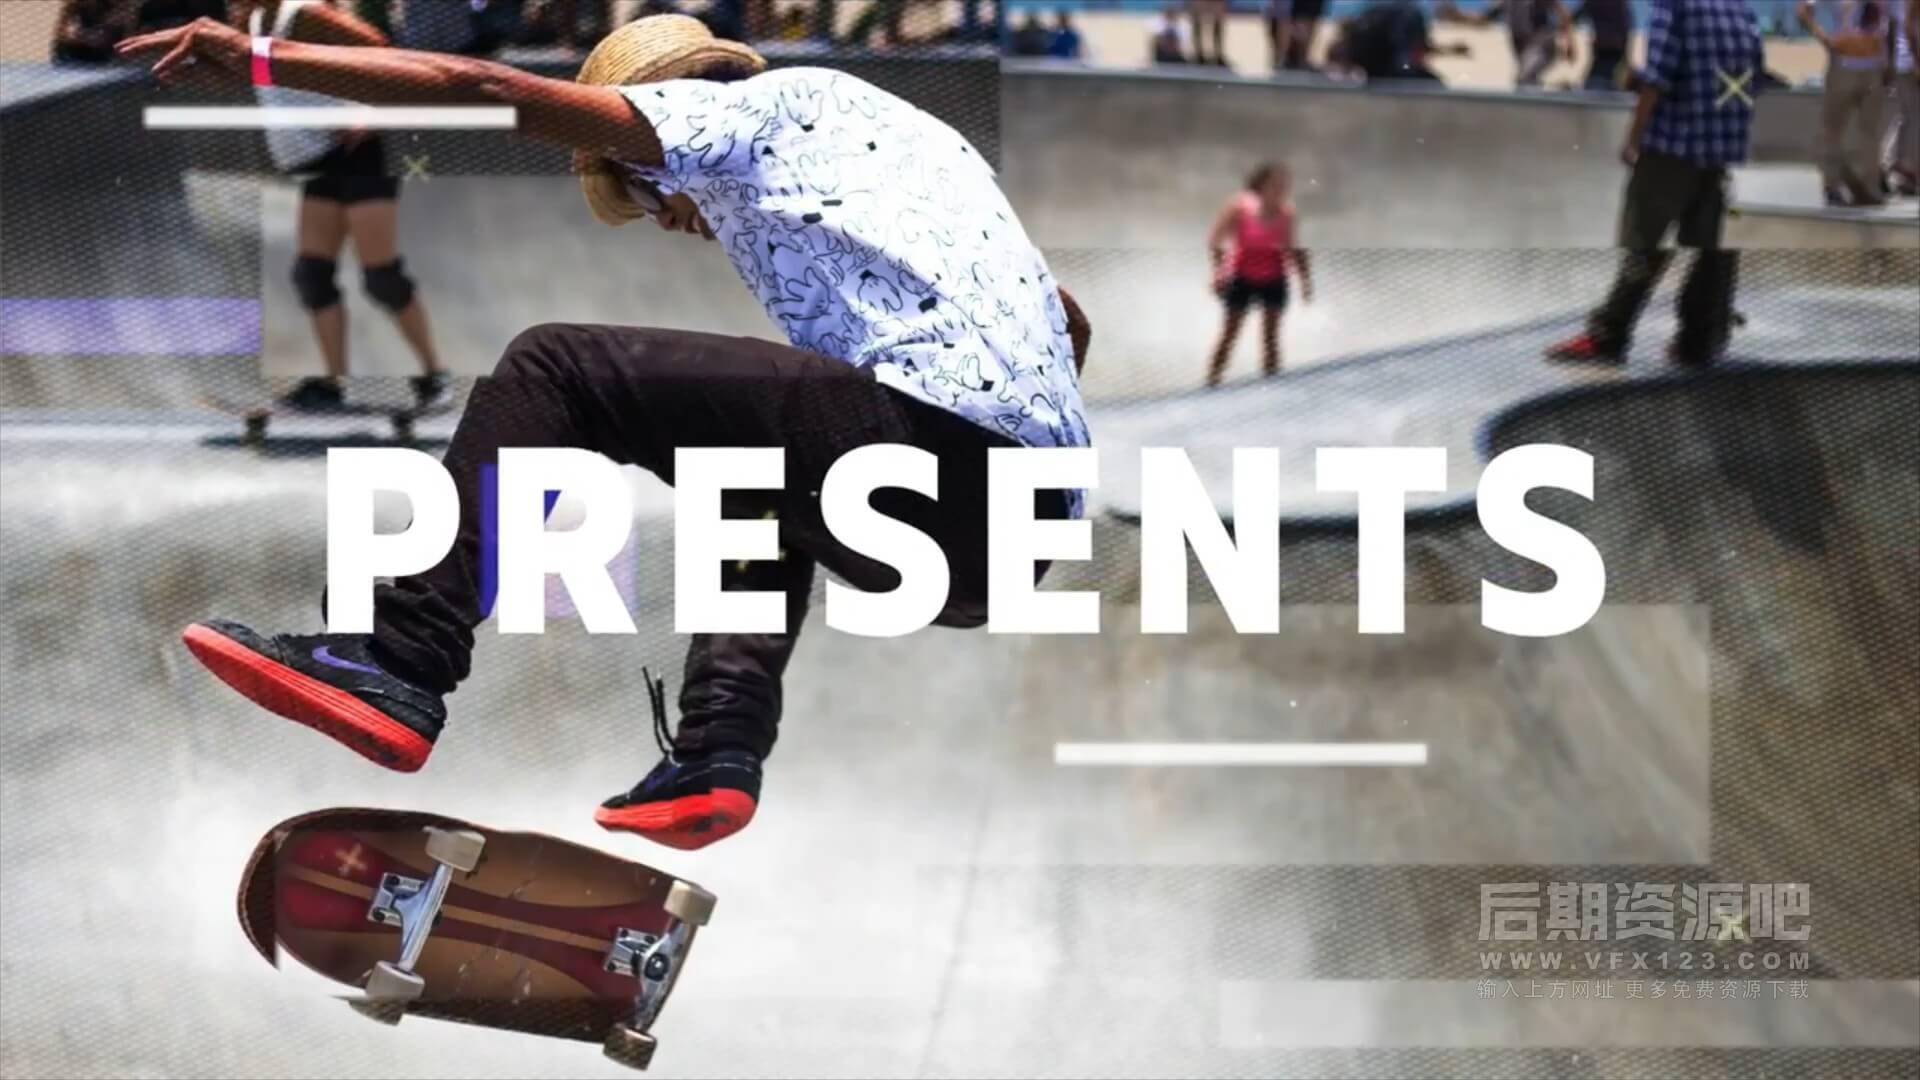 Fcpx主题模板 都市体育竞技类活动开场片头 Urban Sport Promo